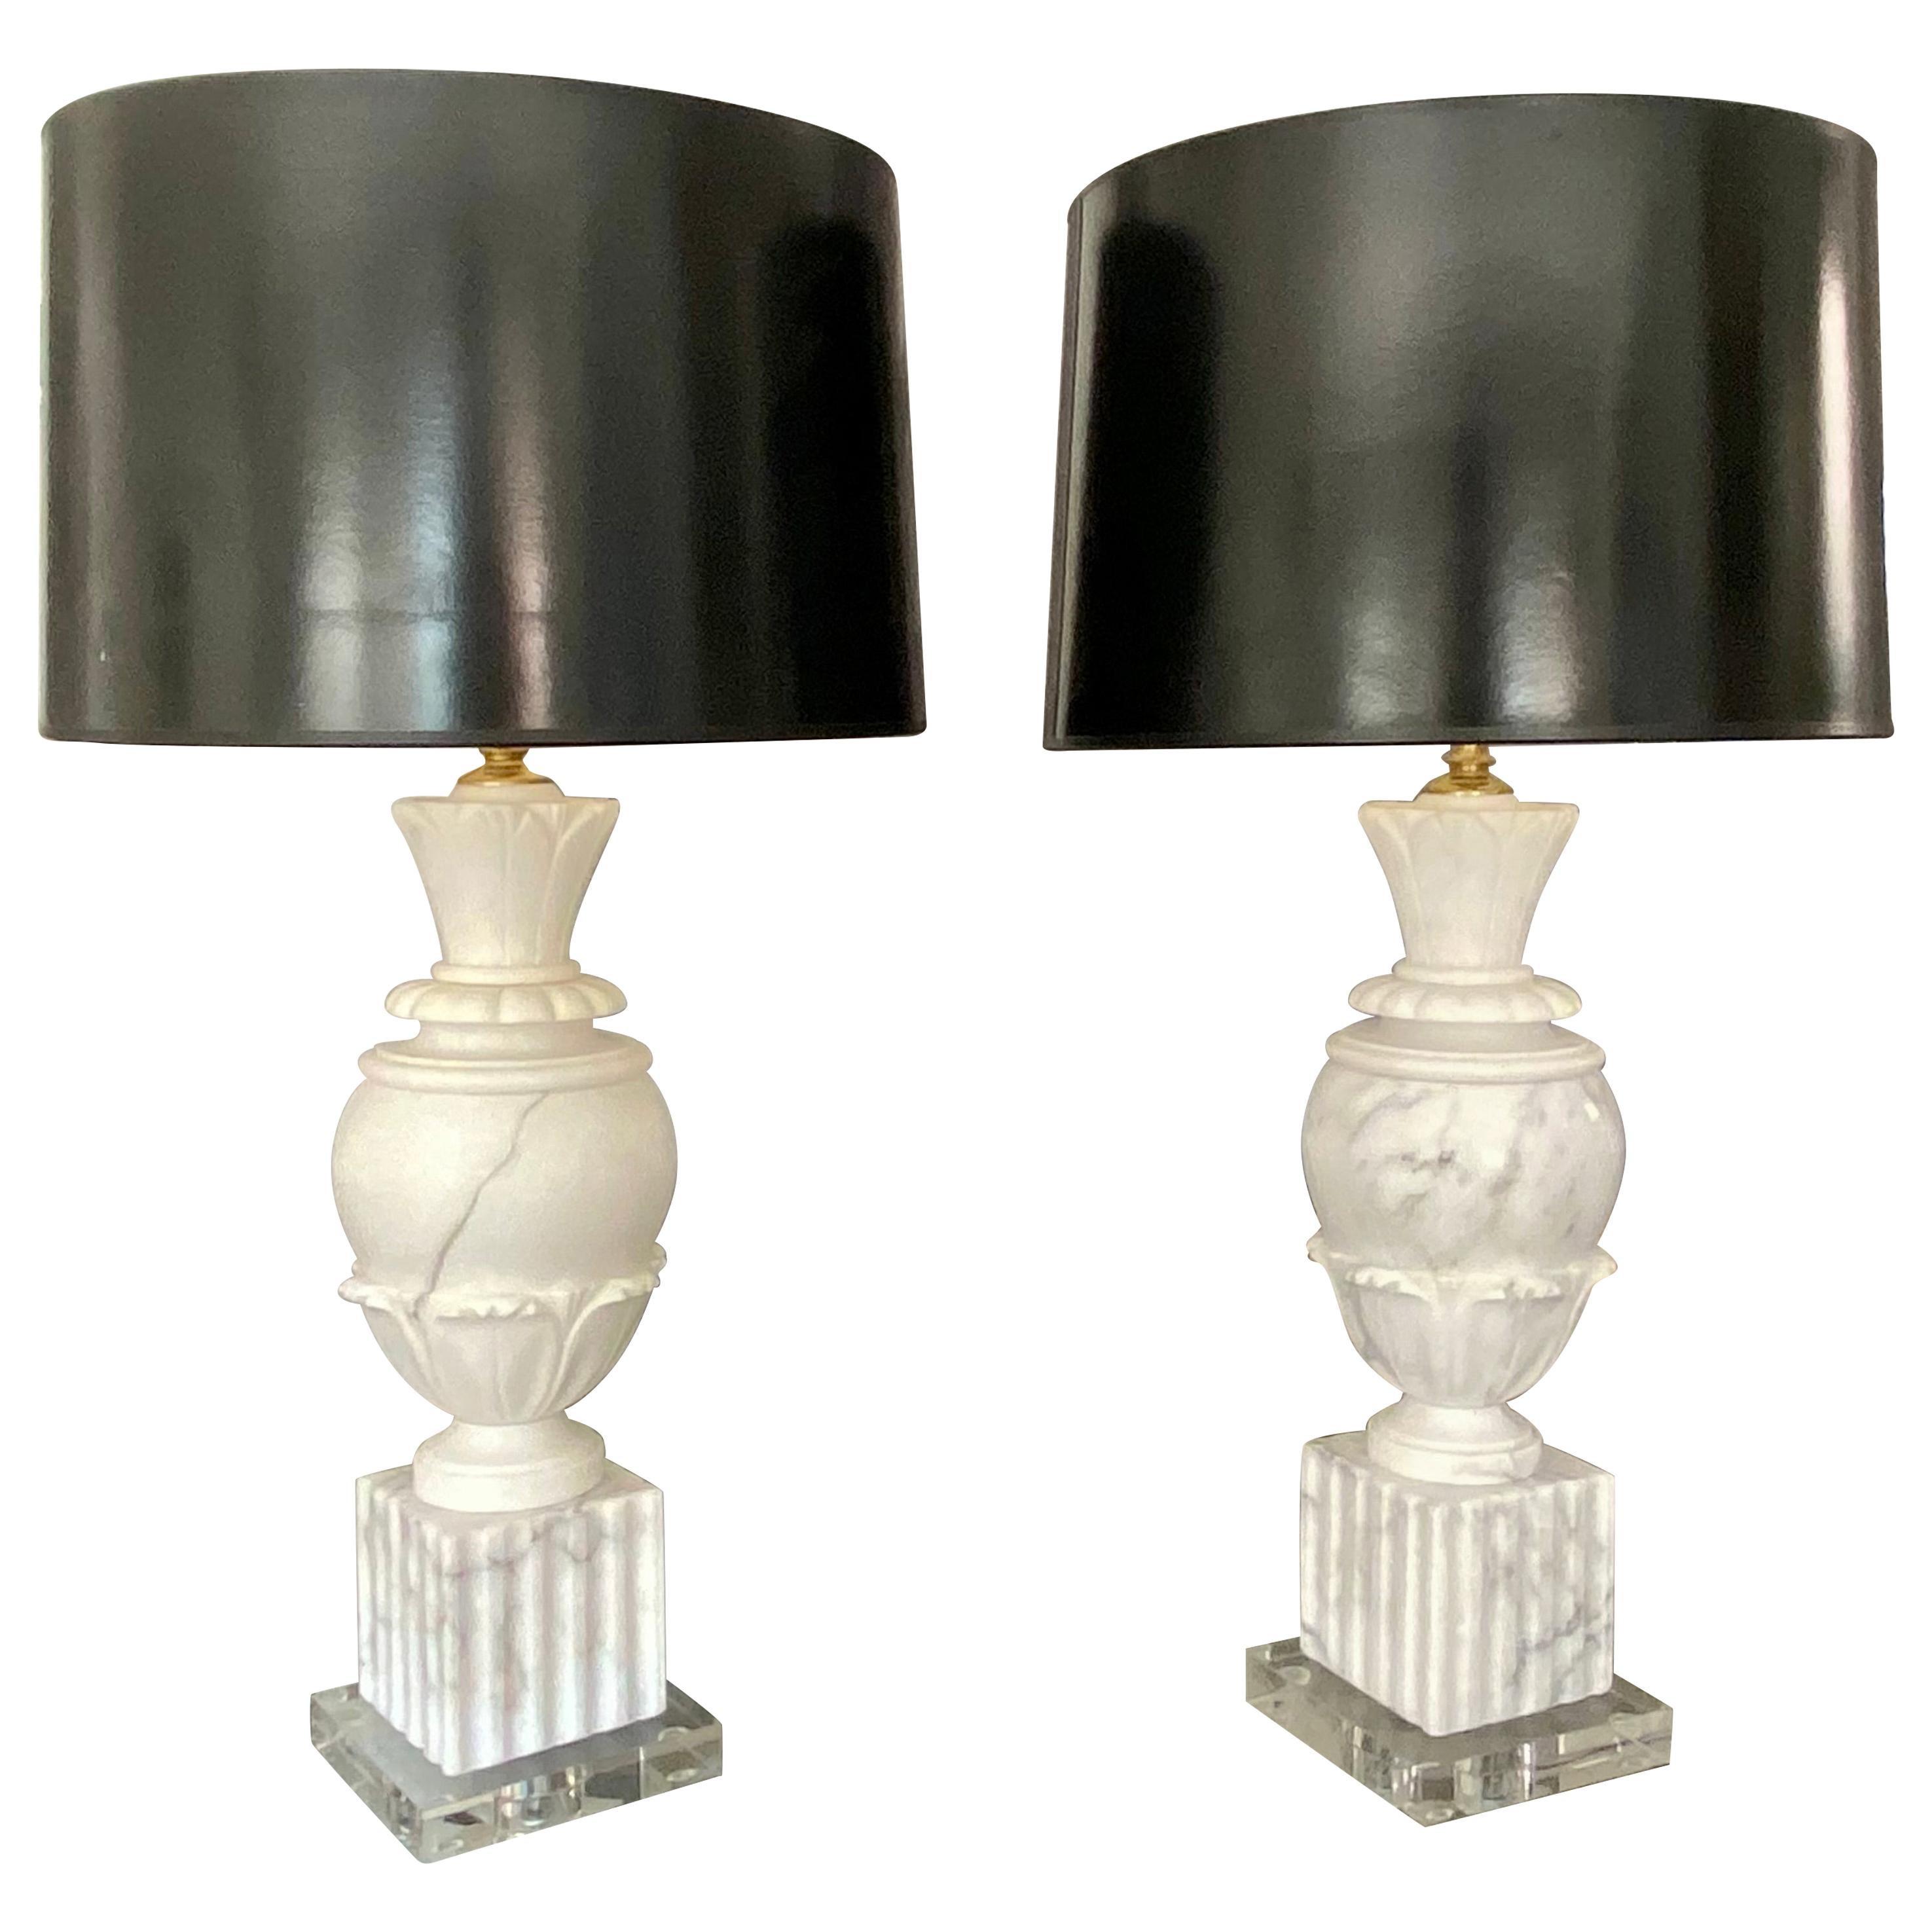 Pair of Italian Urn Neoclassic Alabaster Table Lamps